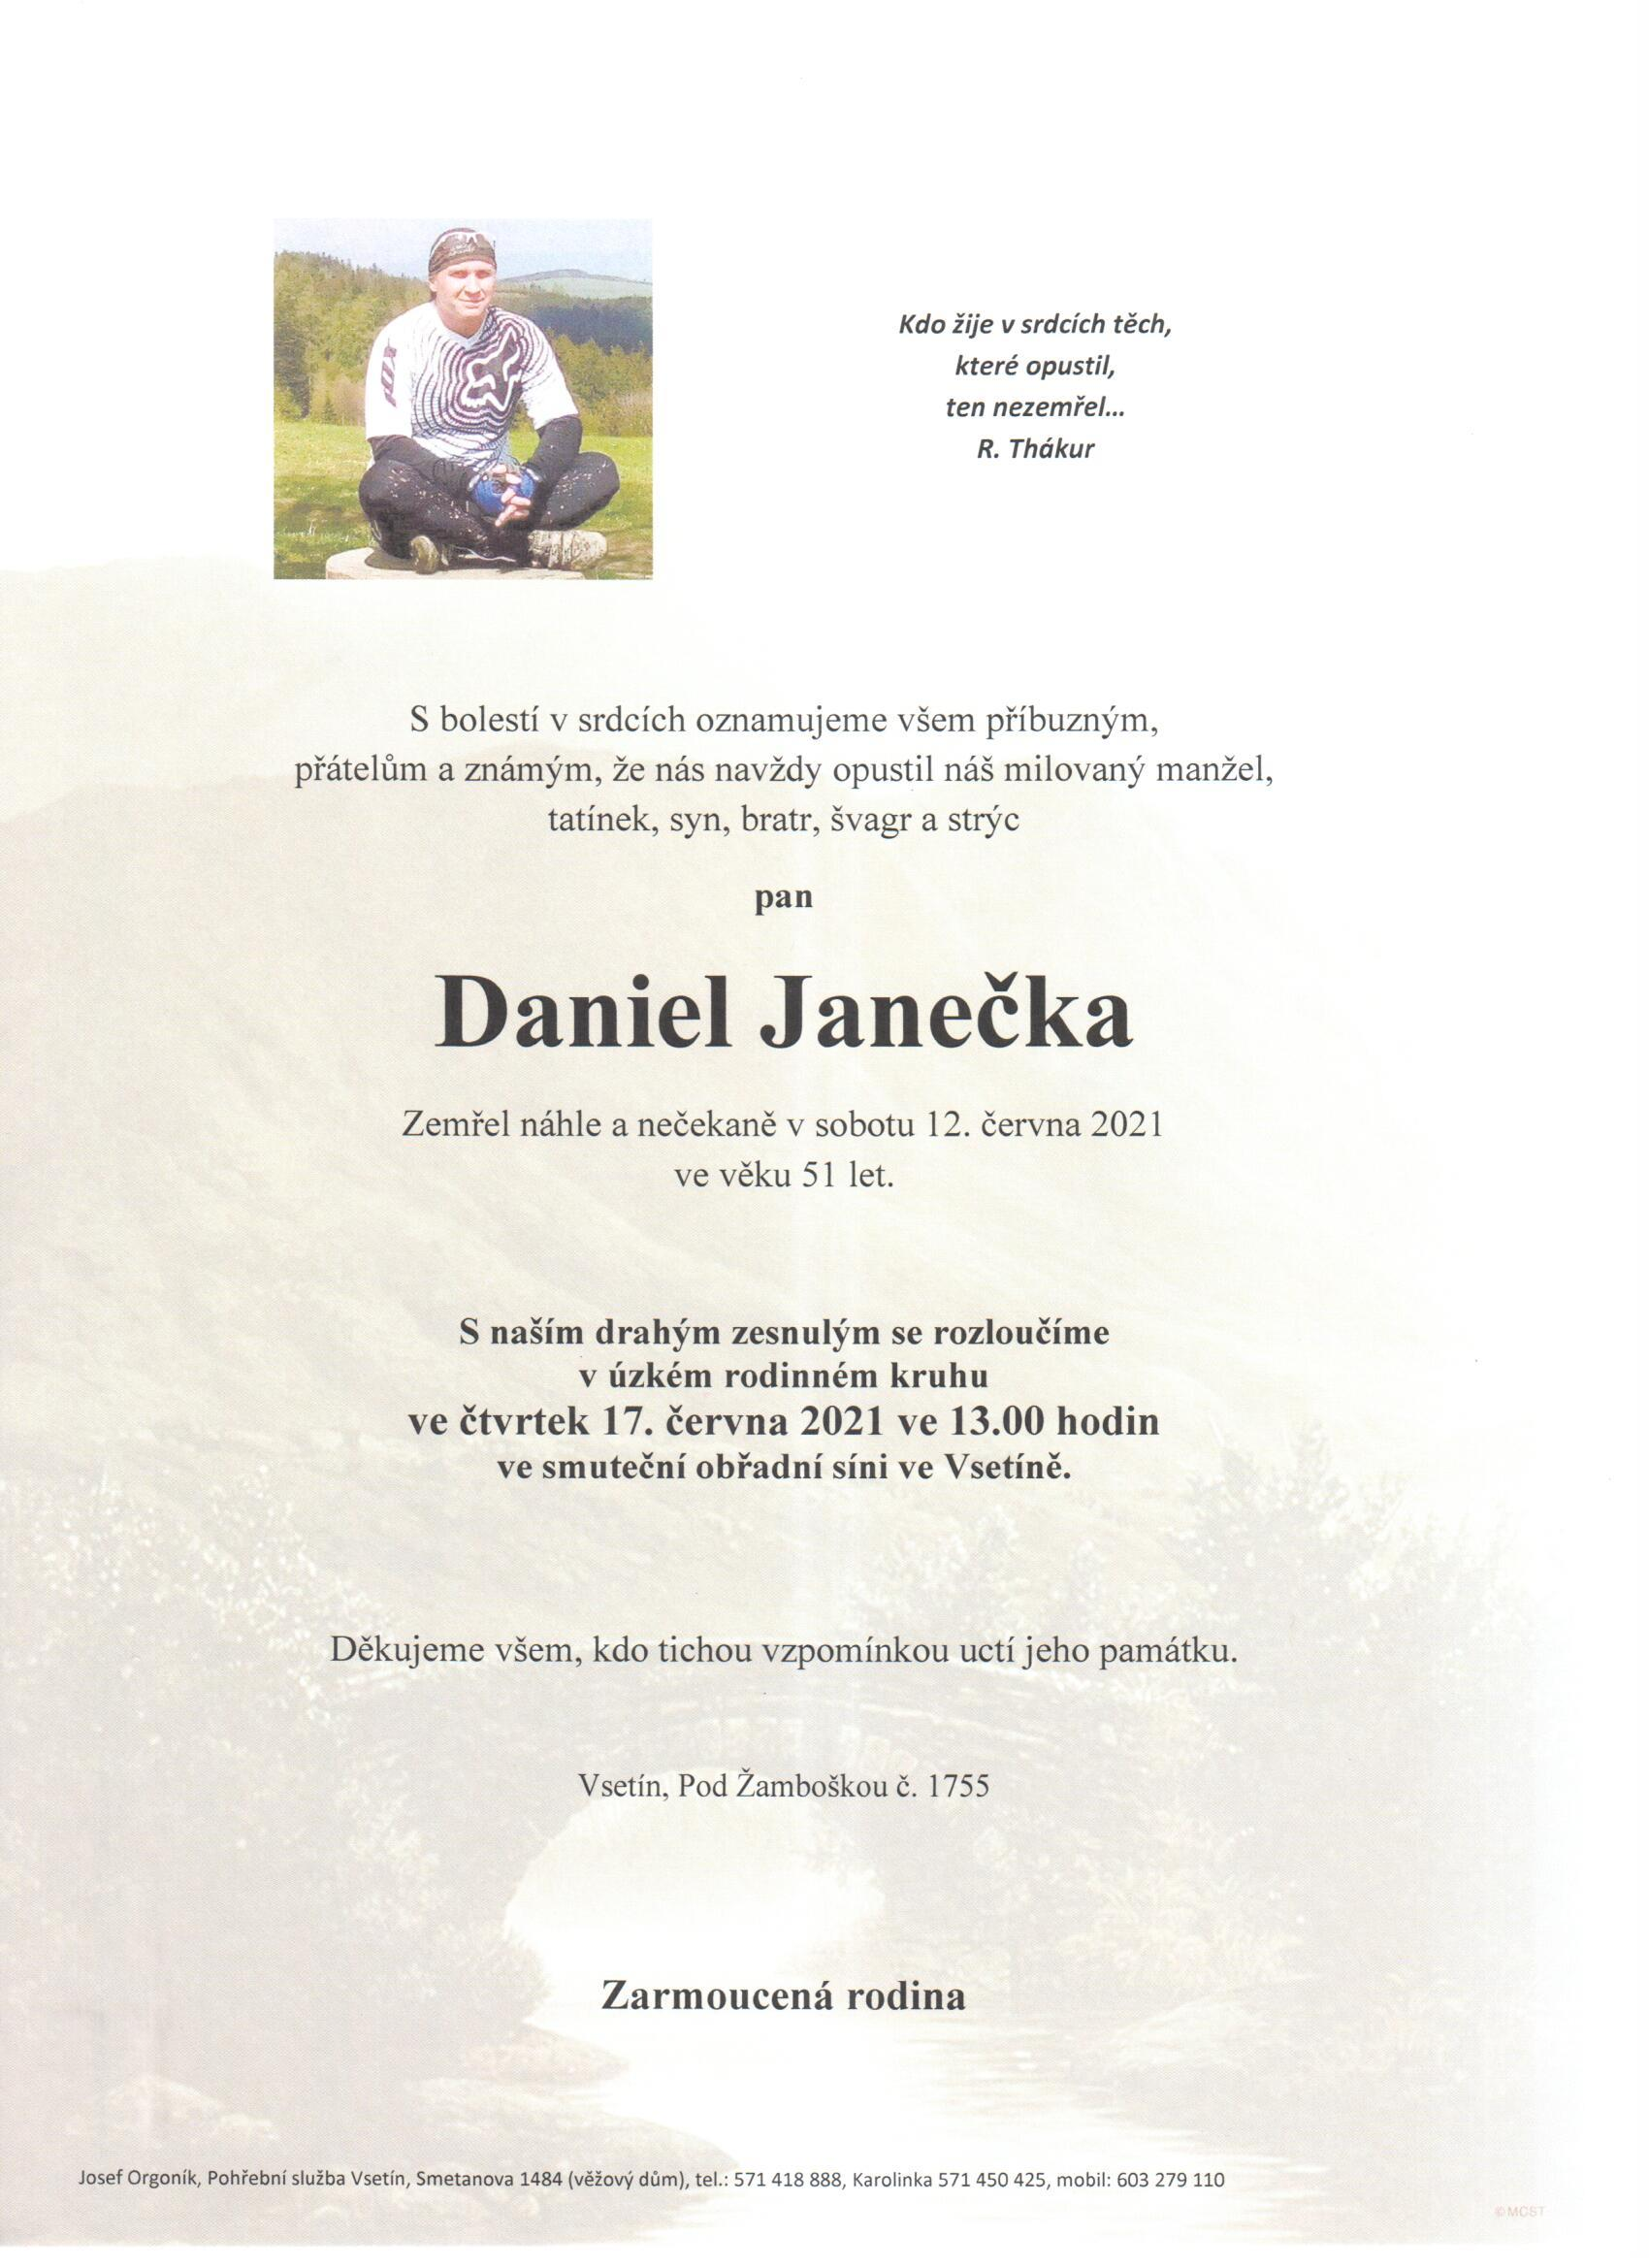 Daniel Janečka